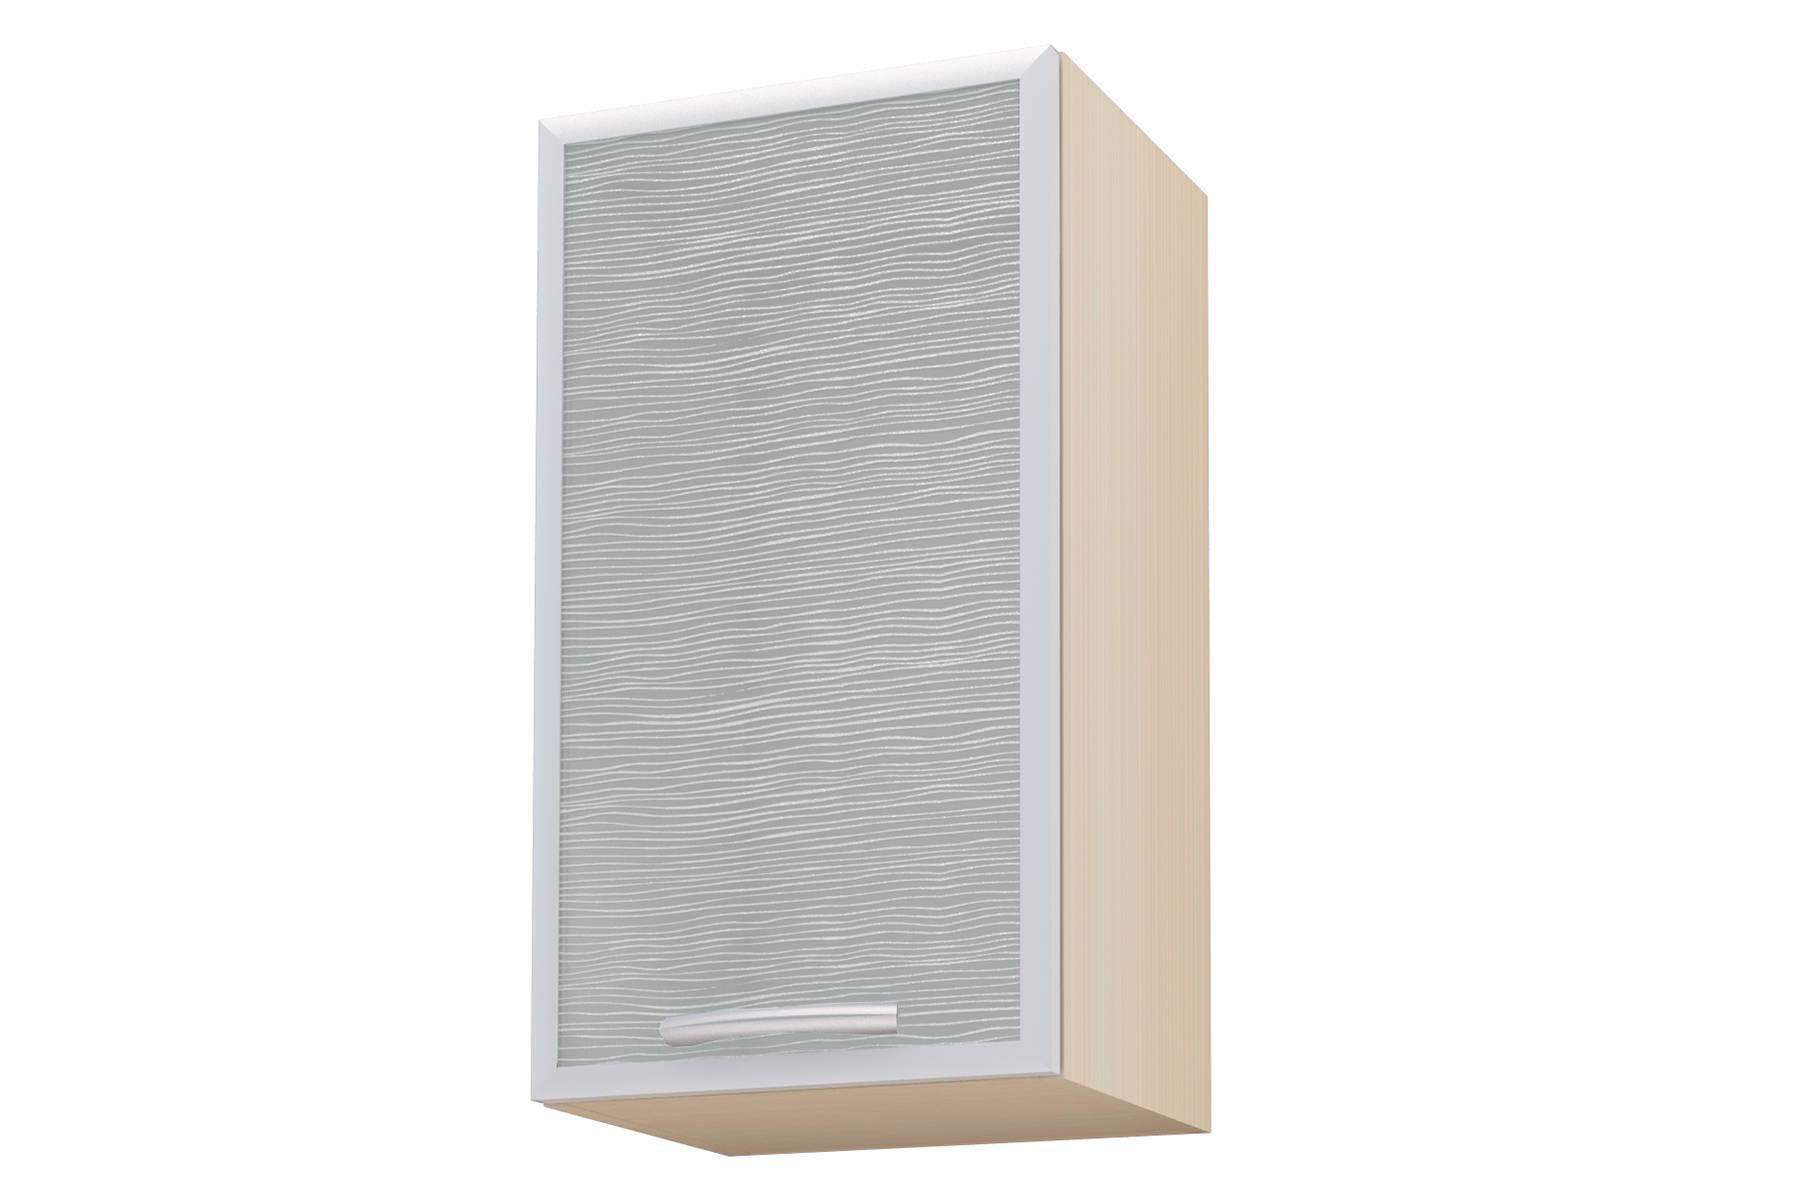 Селена шкаф навесной ш.400, фасад левый декор уралкерамика бриз вс11бр604 60x20